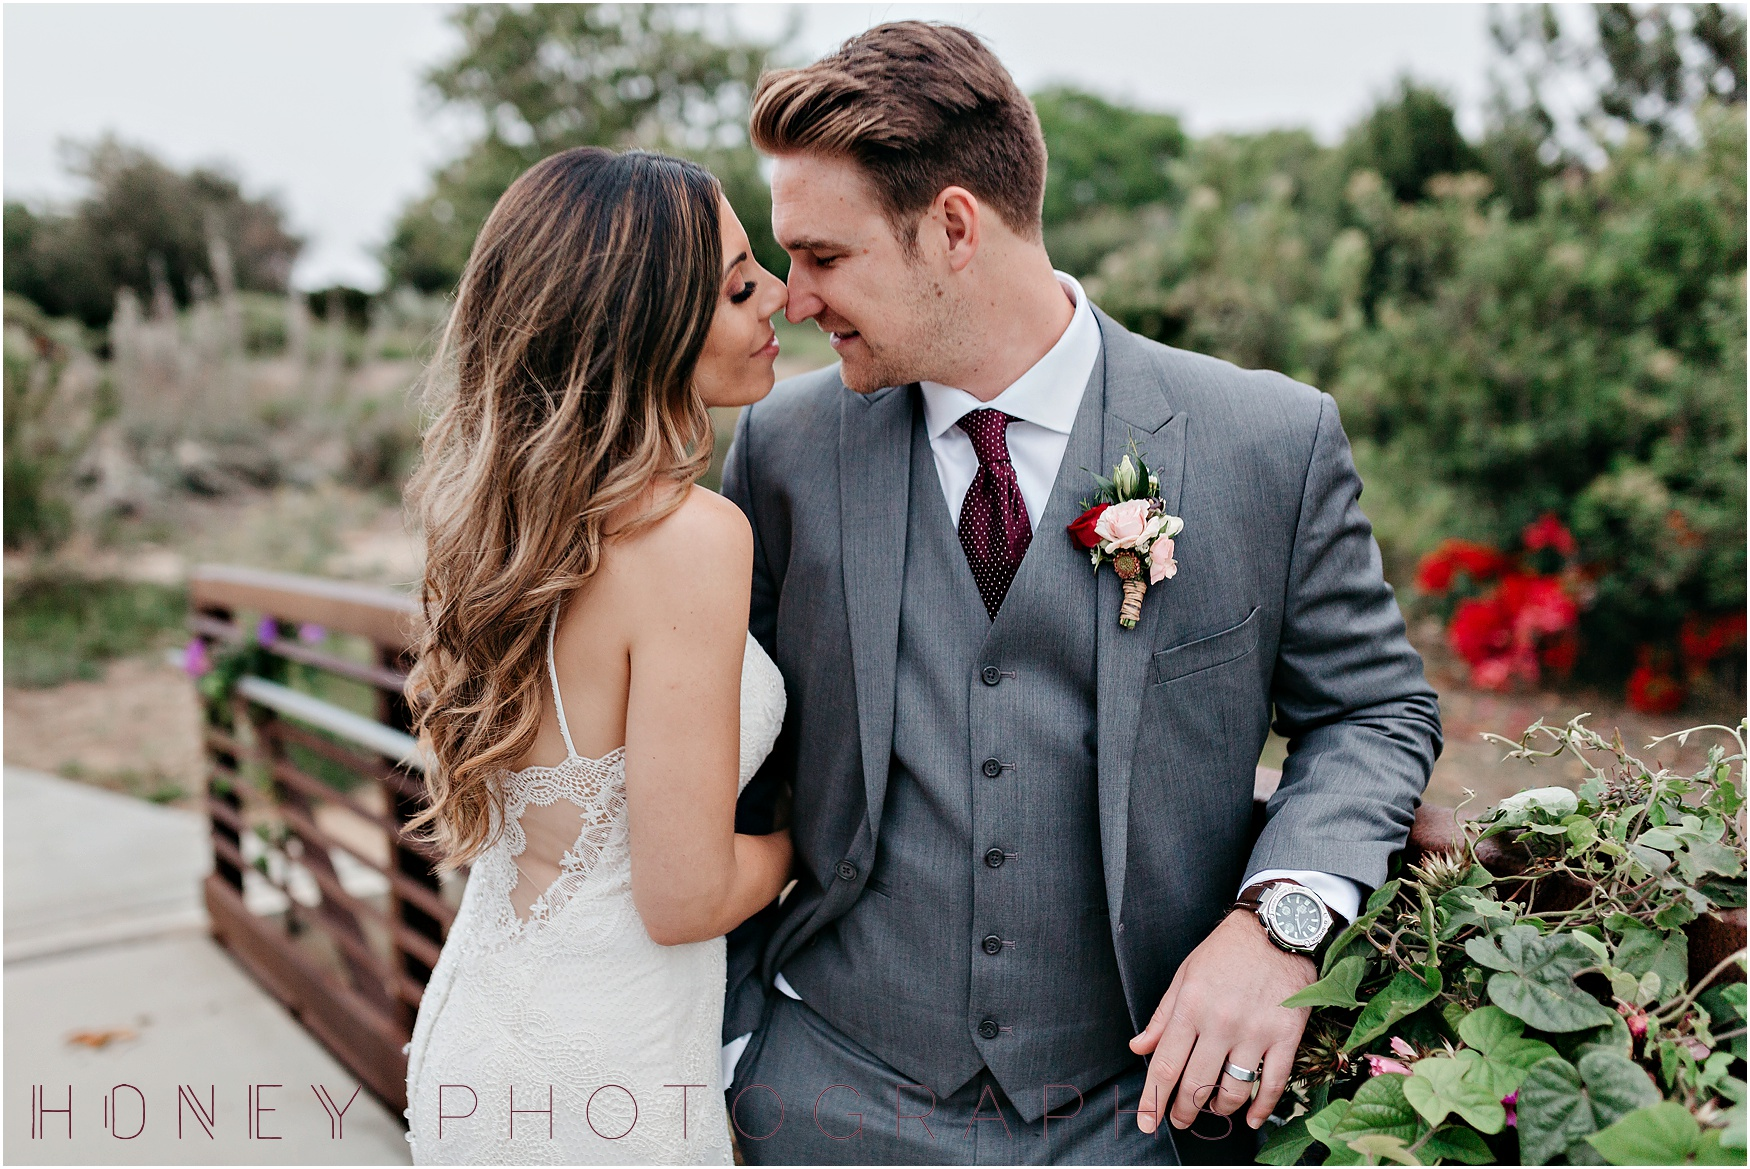 garden-classic-burgundy-jewel-tone-luxury-pacific-event-oceanside-wedding56.jpg